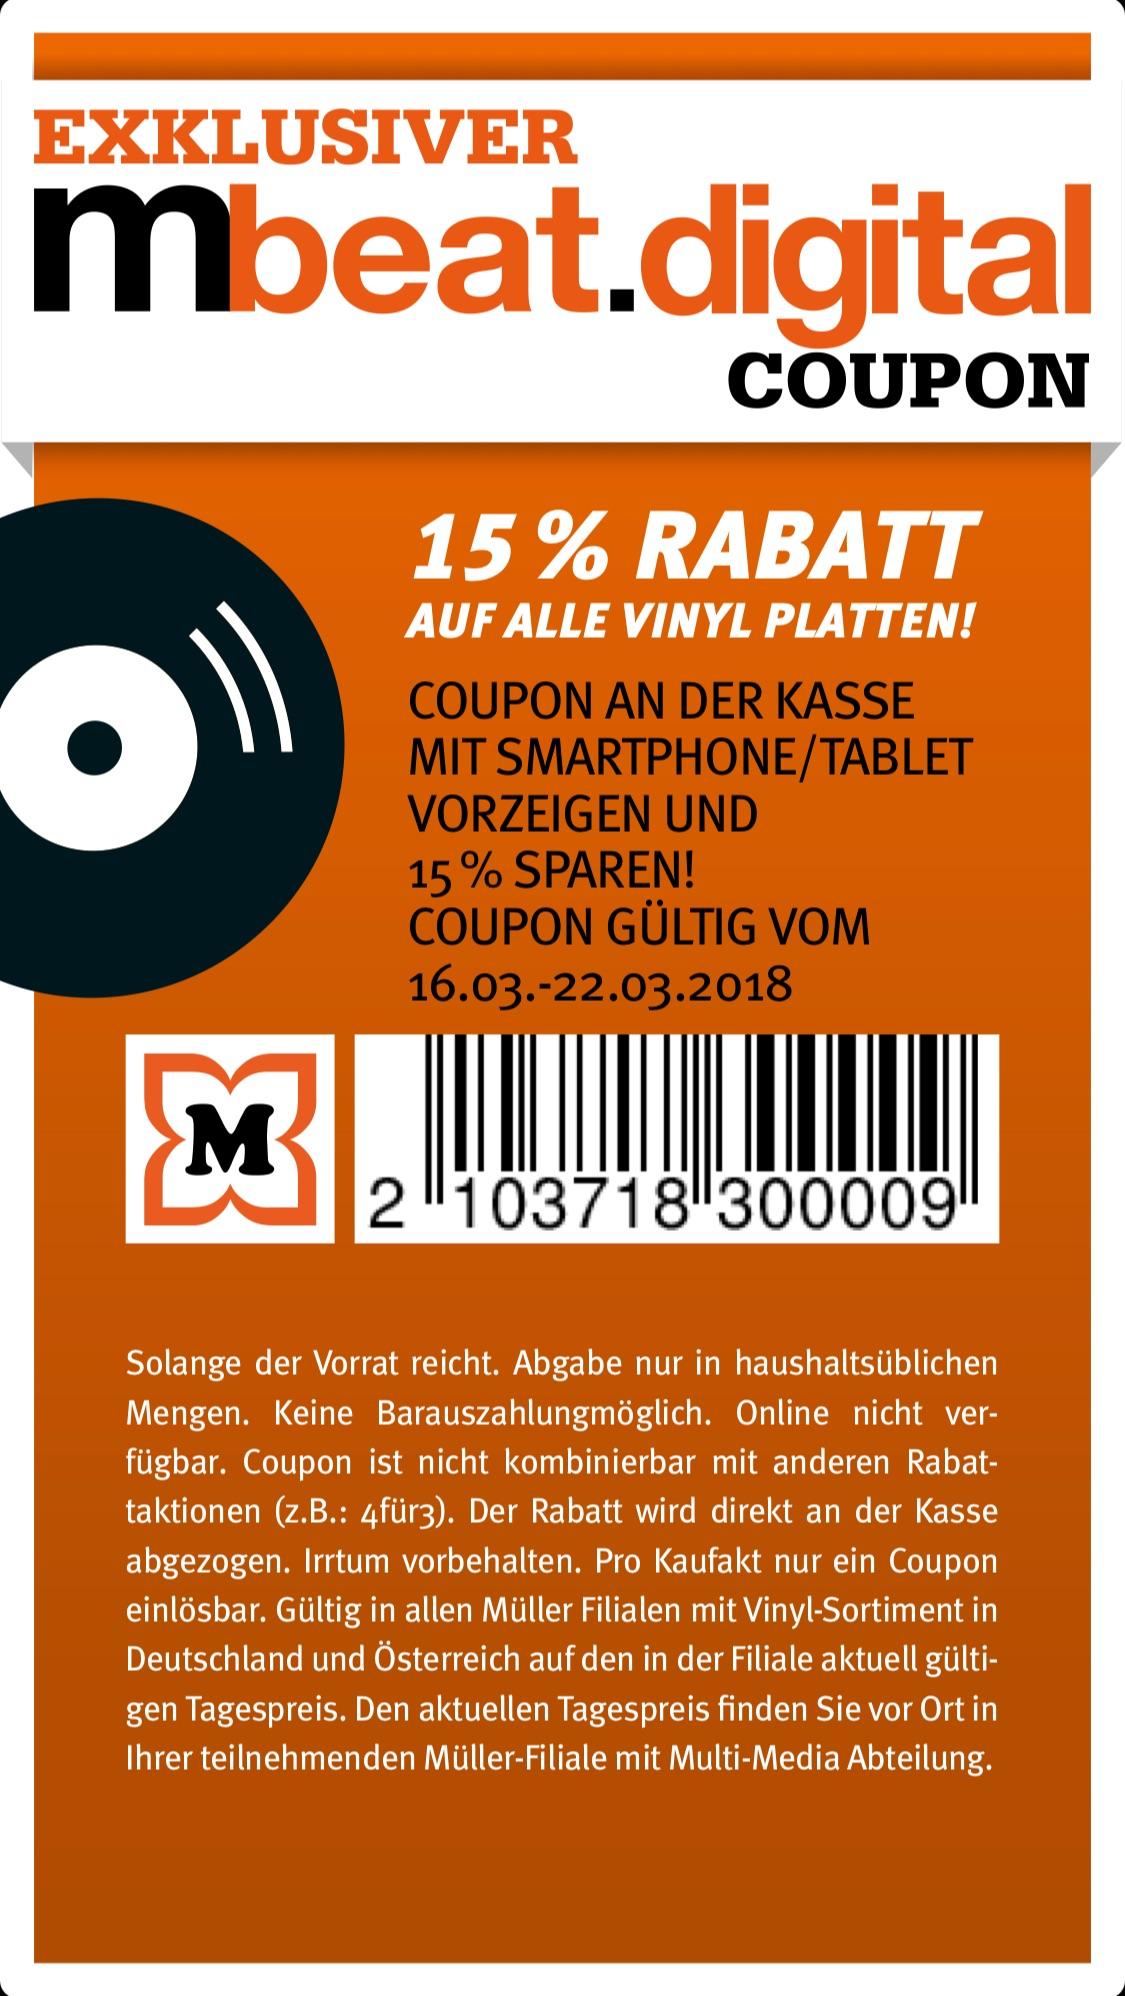 15% Rabatt auf alle Vinyl Platten @ Müller (Drogeriemarkt)